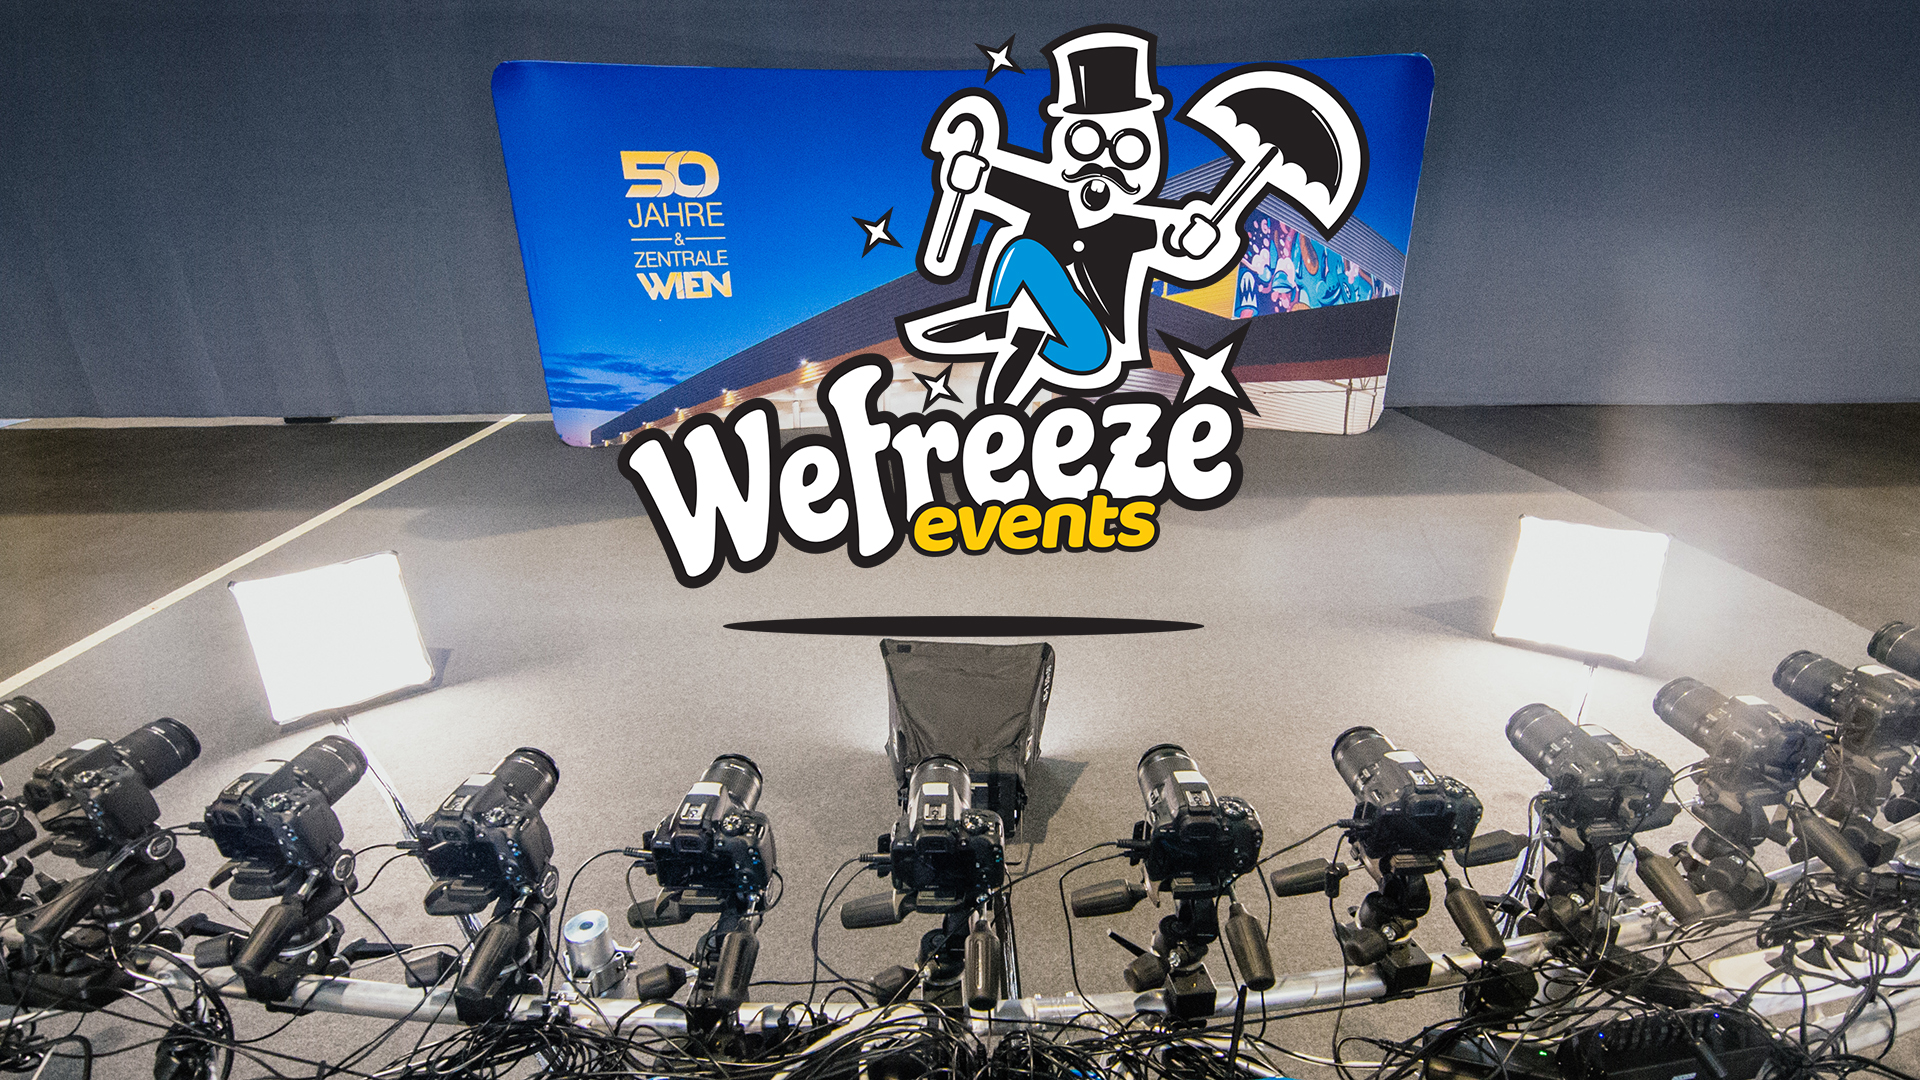 Wefreeze Event Flamingosystem